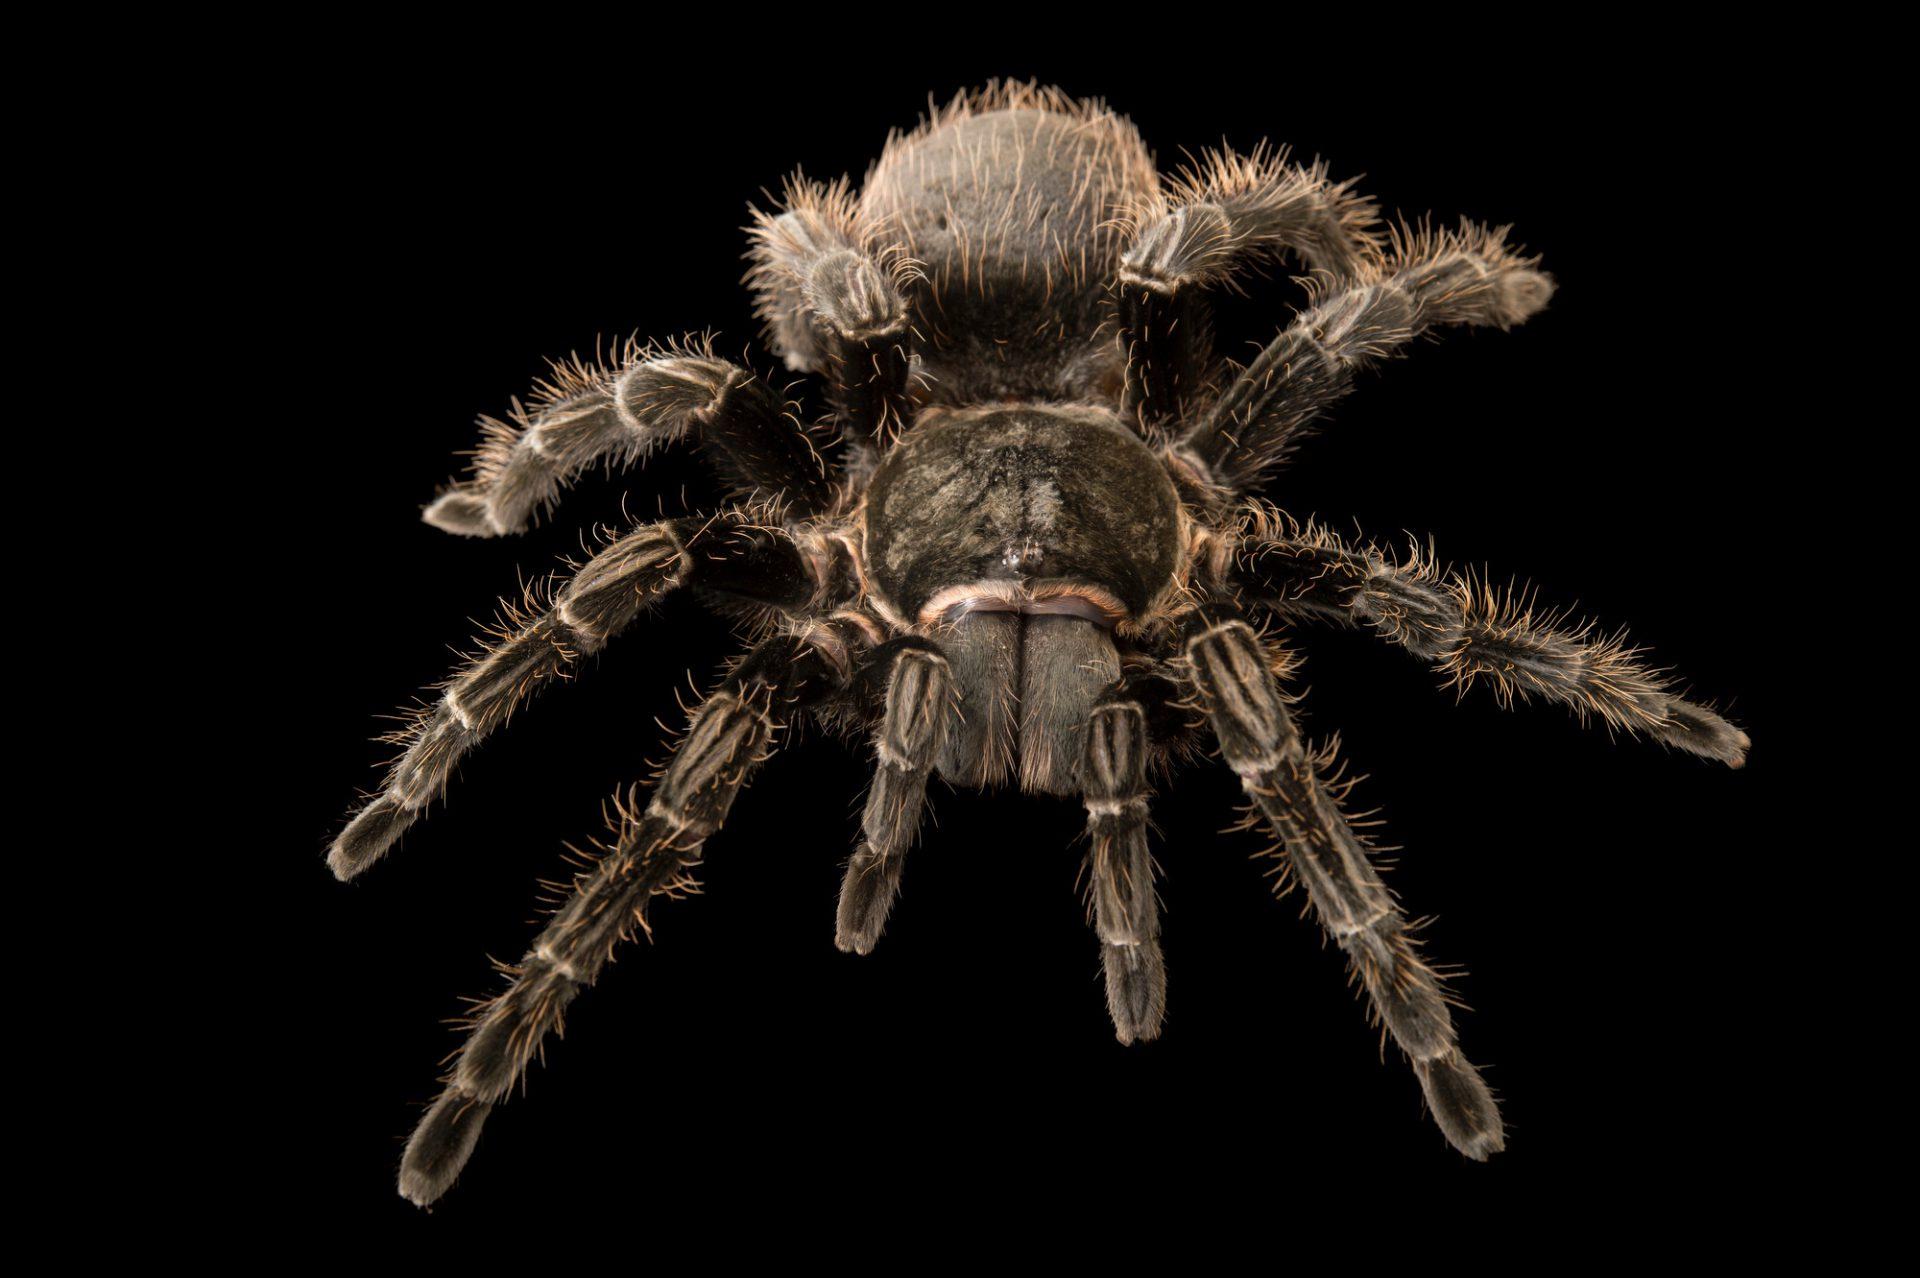 Photo: Curly hair tarantula (Brachypelma albopilosum) at the Topeka Zoo.